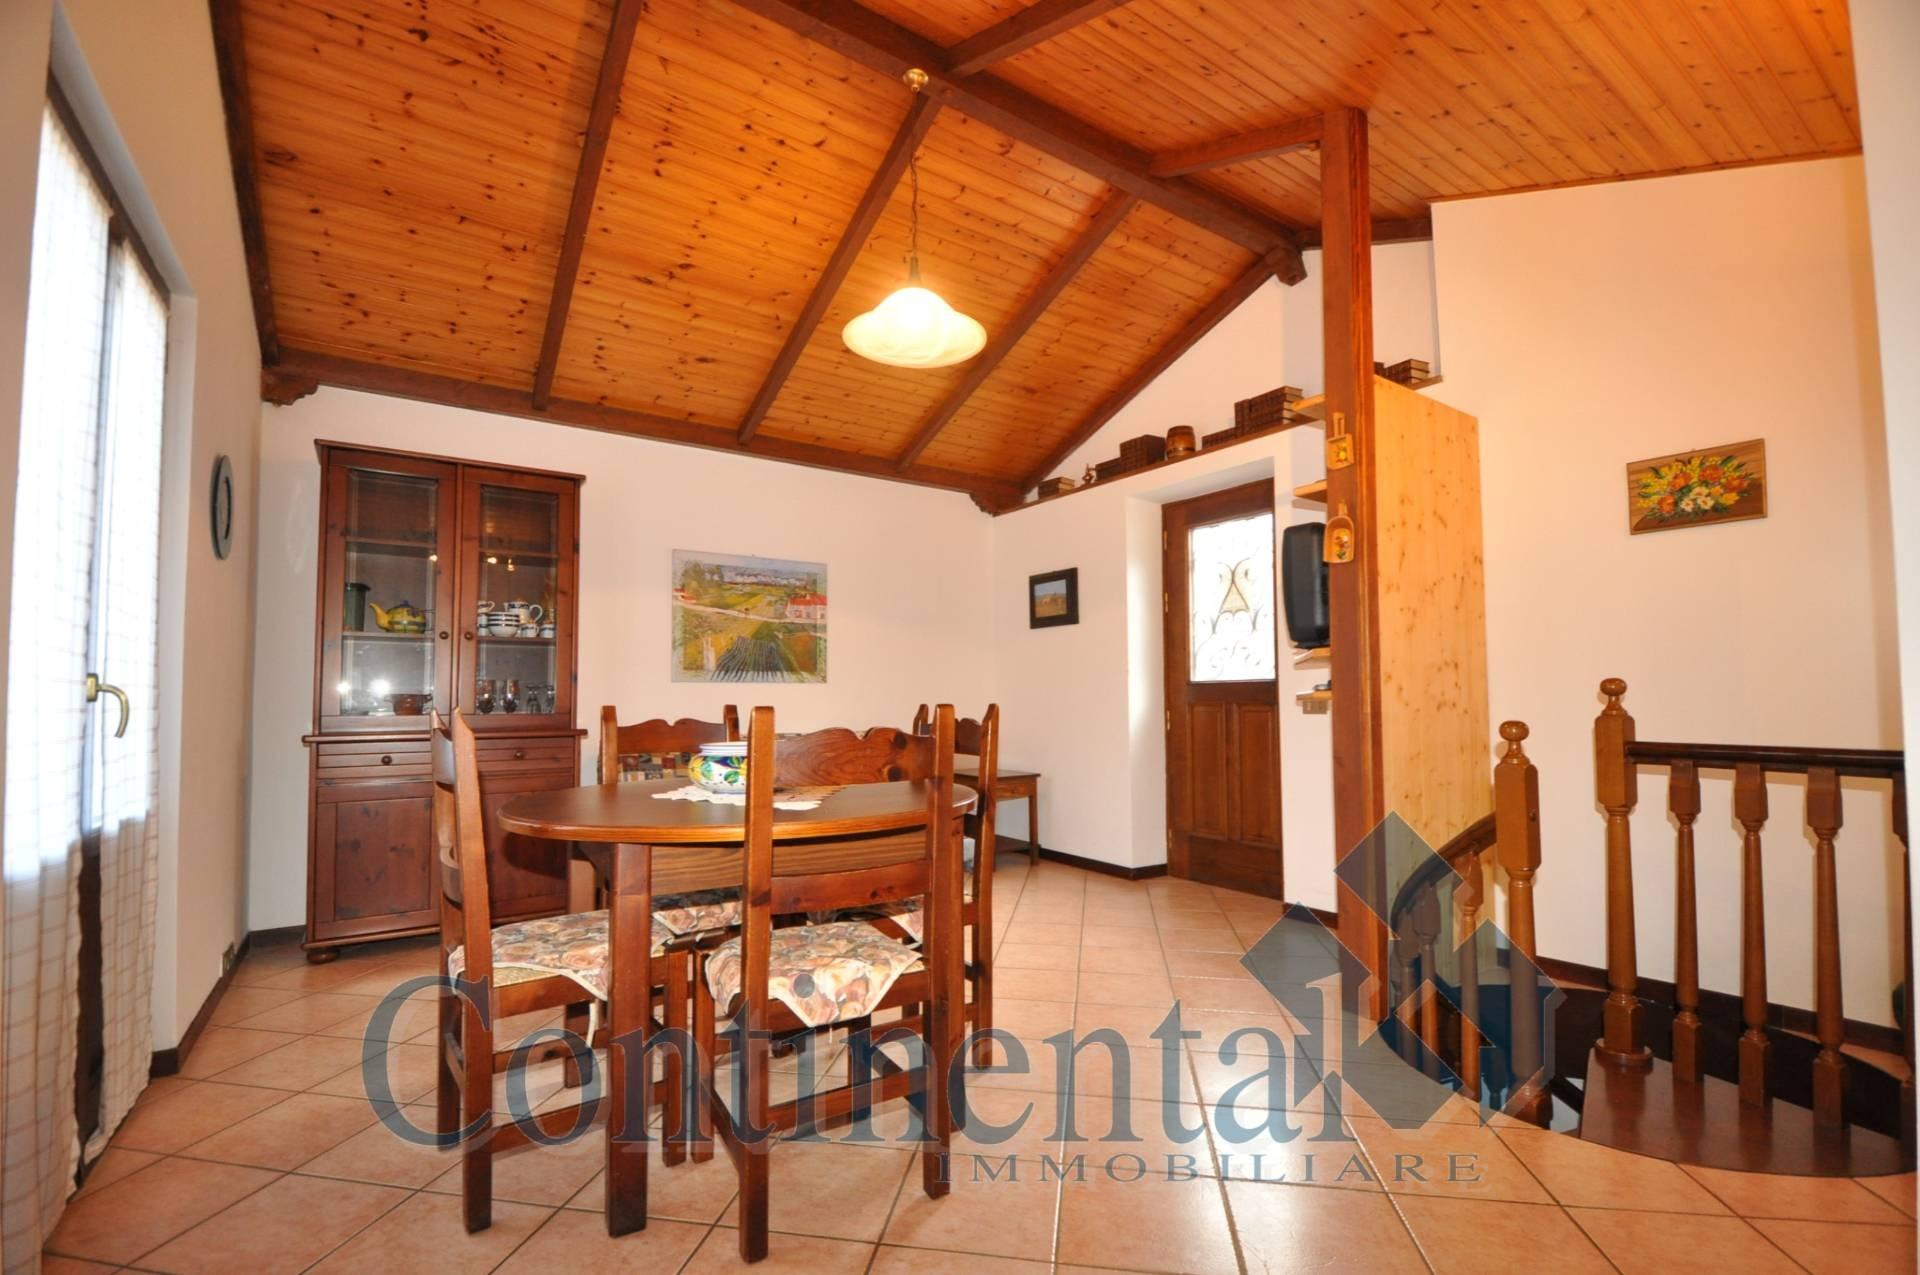 Foto 7 di Rustico / Casale Via Muggiasca, Santa Brigida